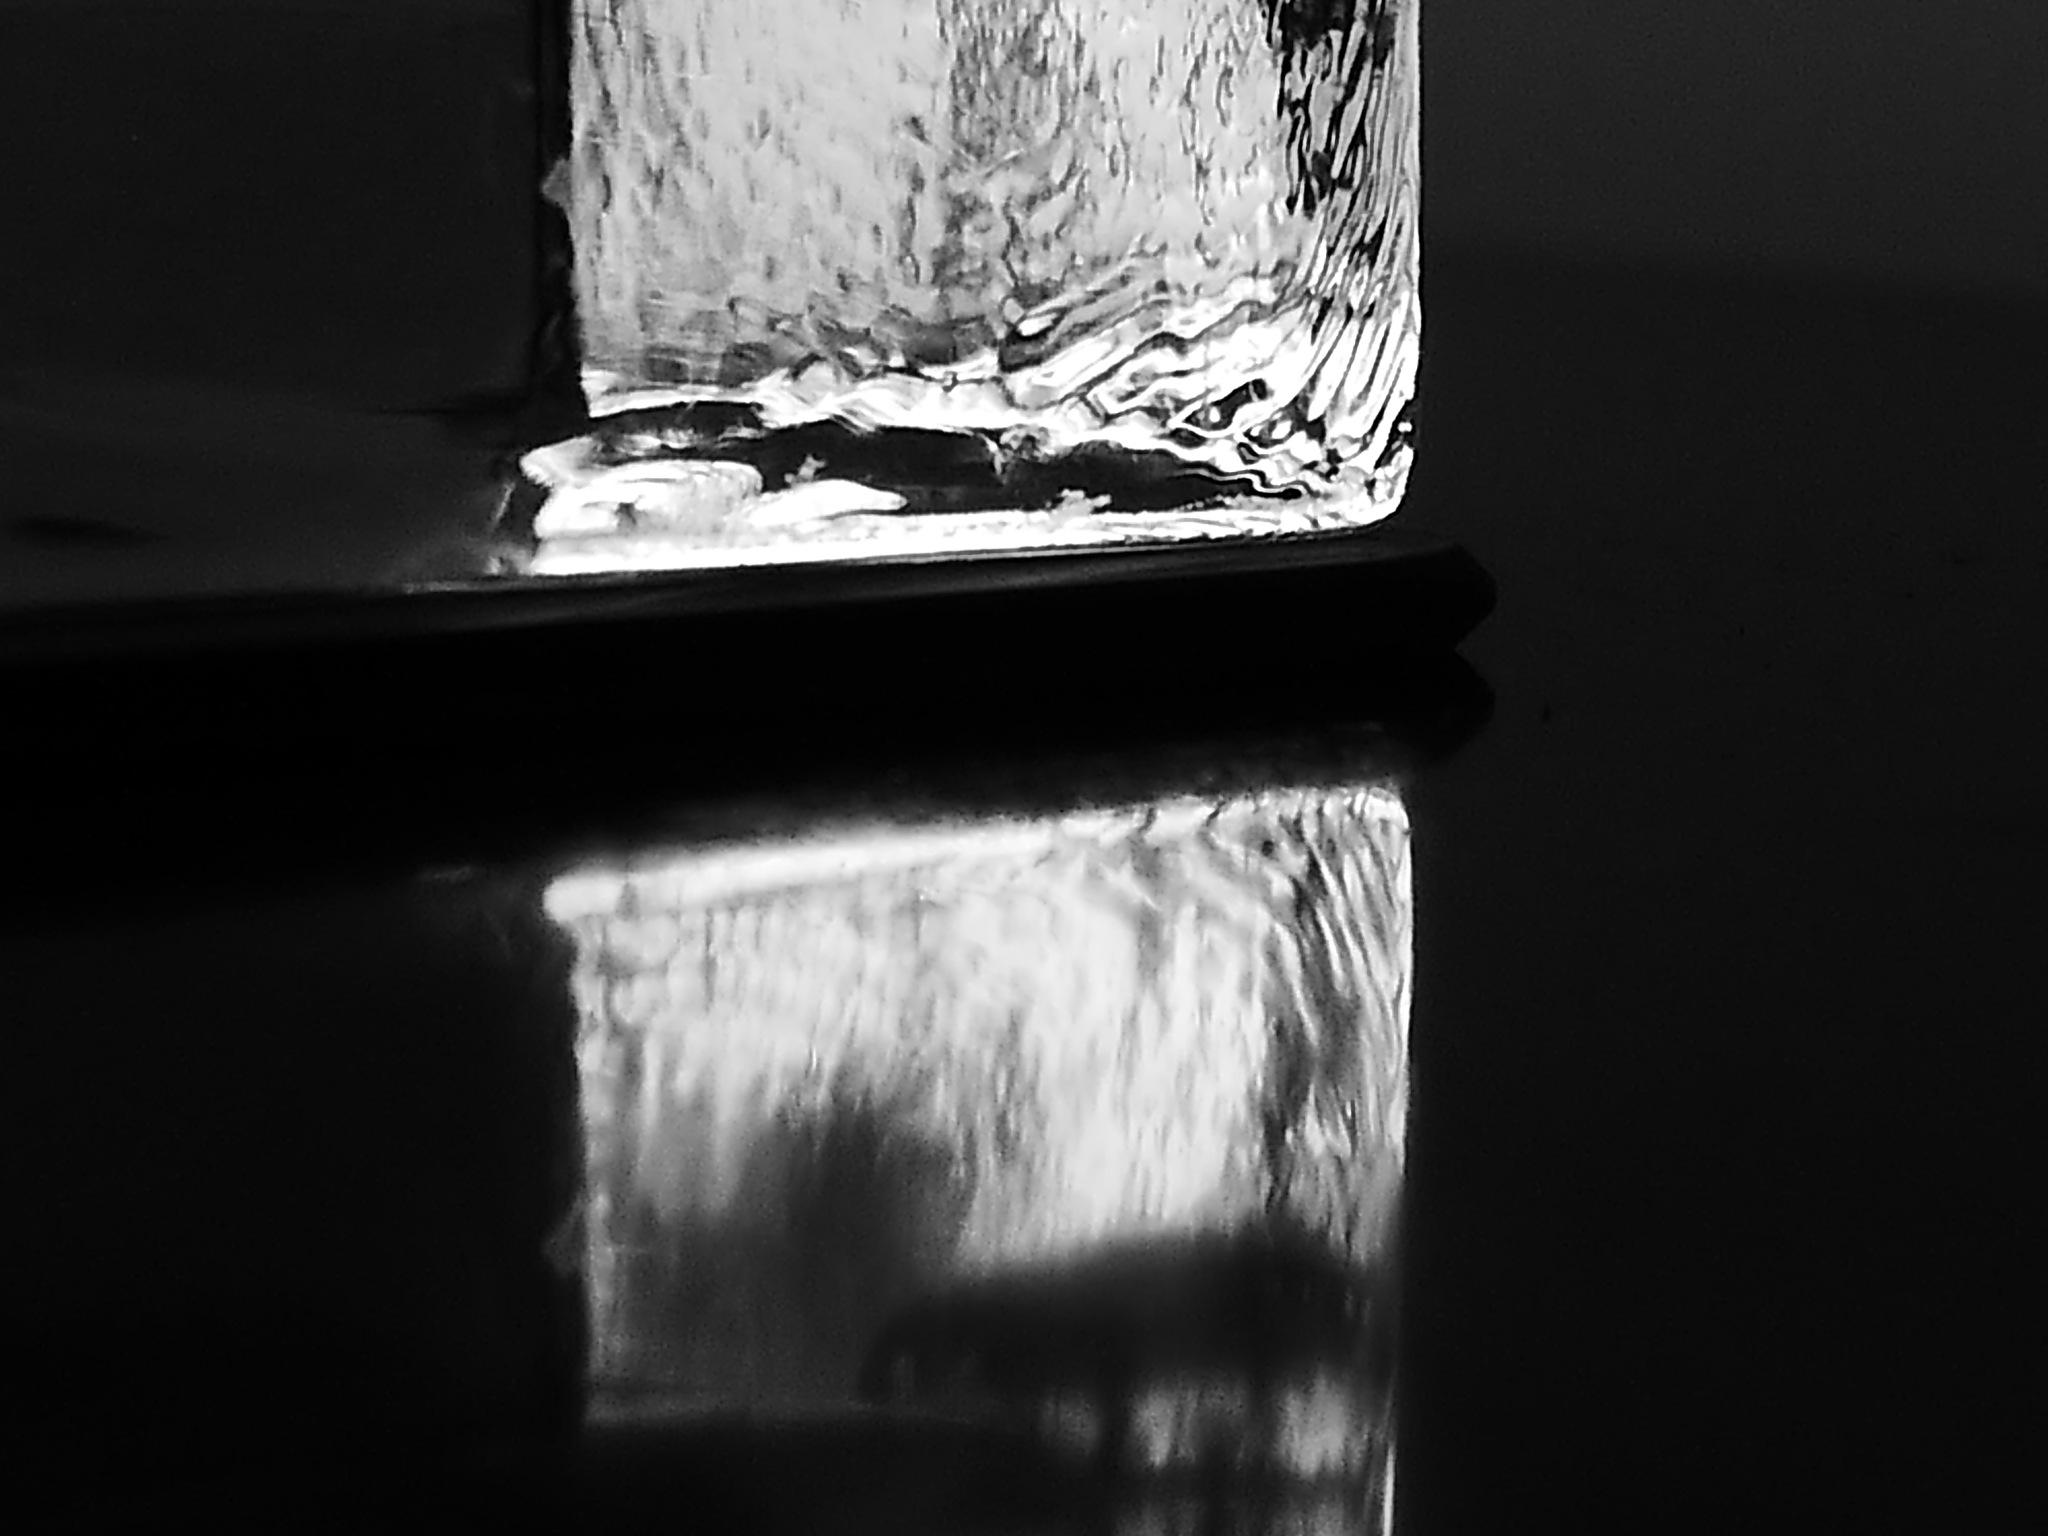 simply glass by james arthur